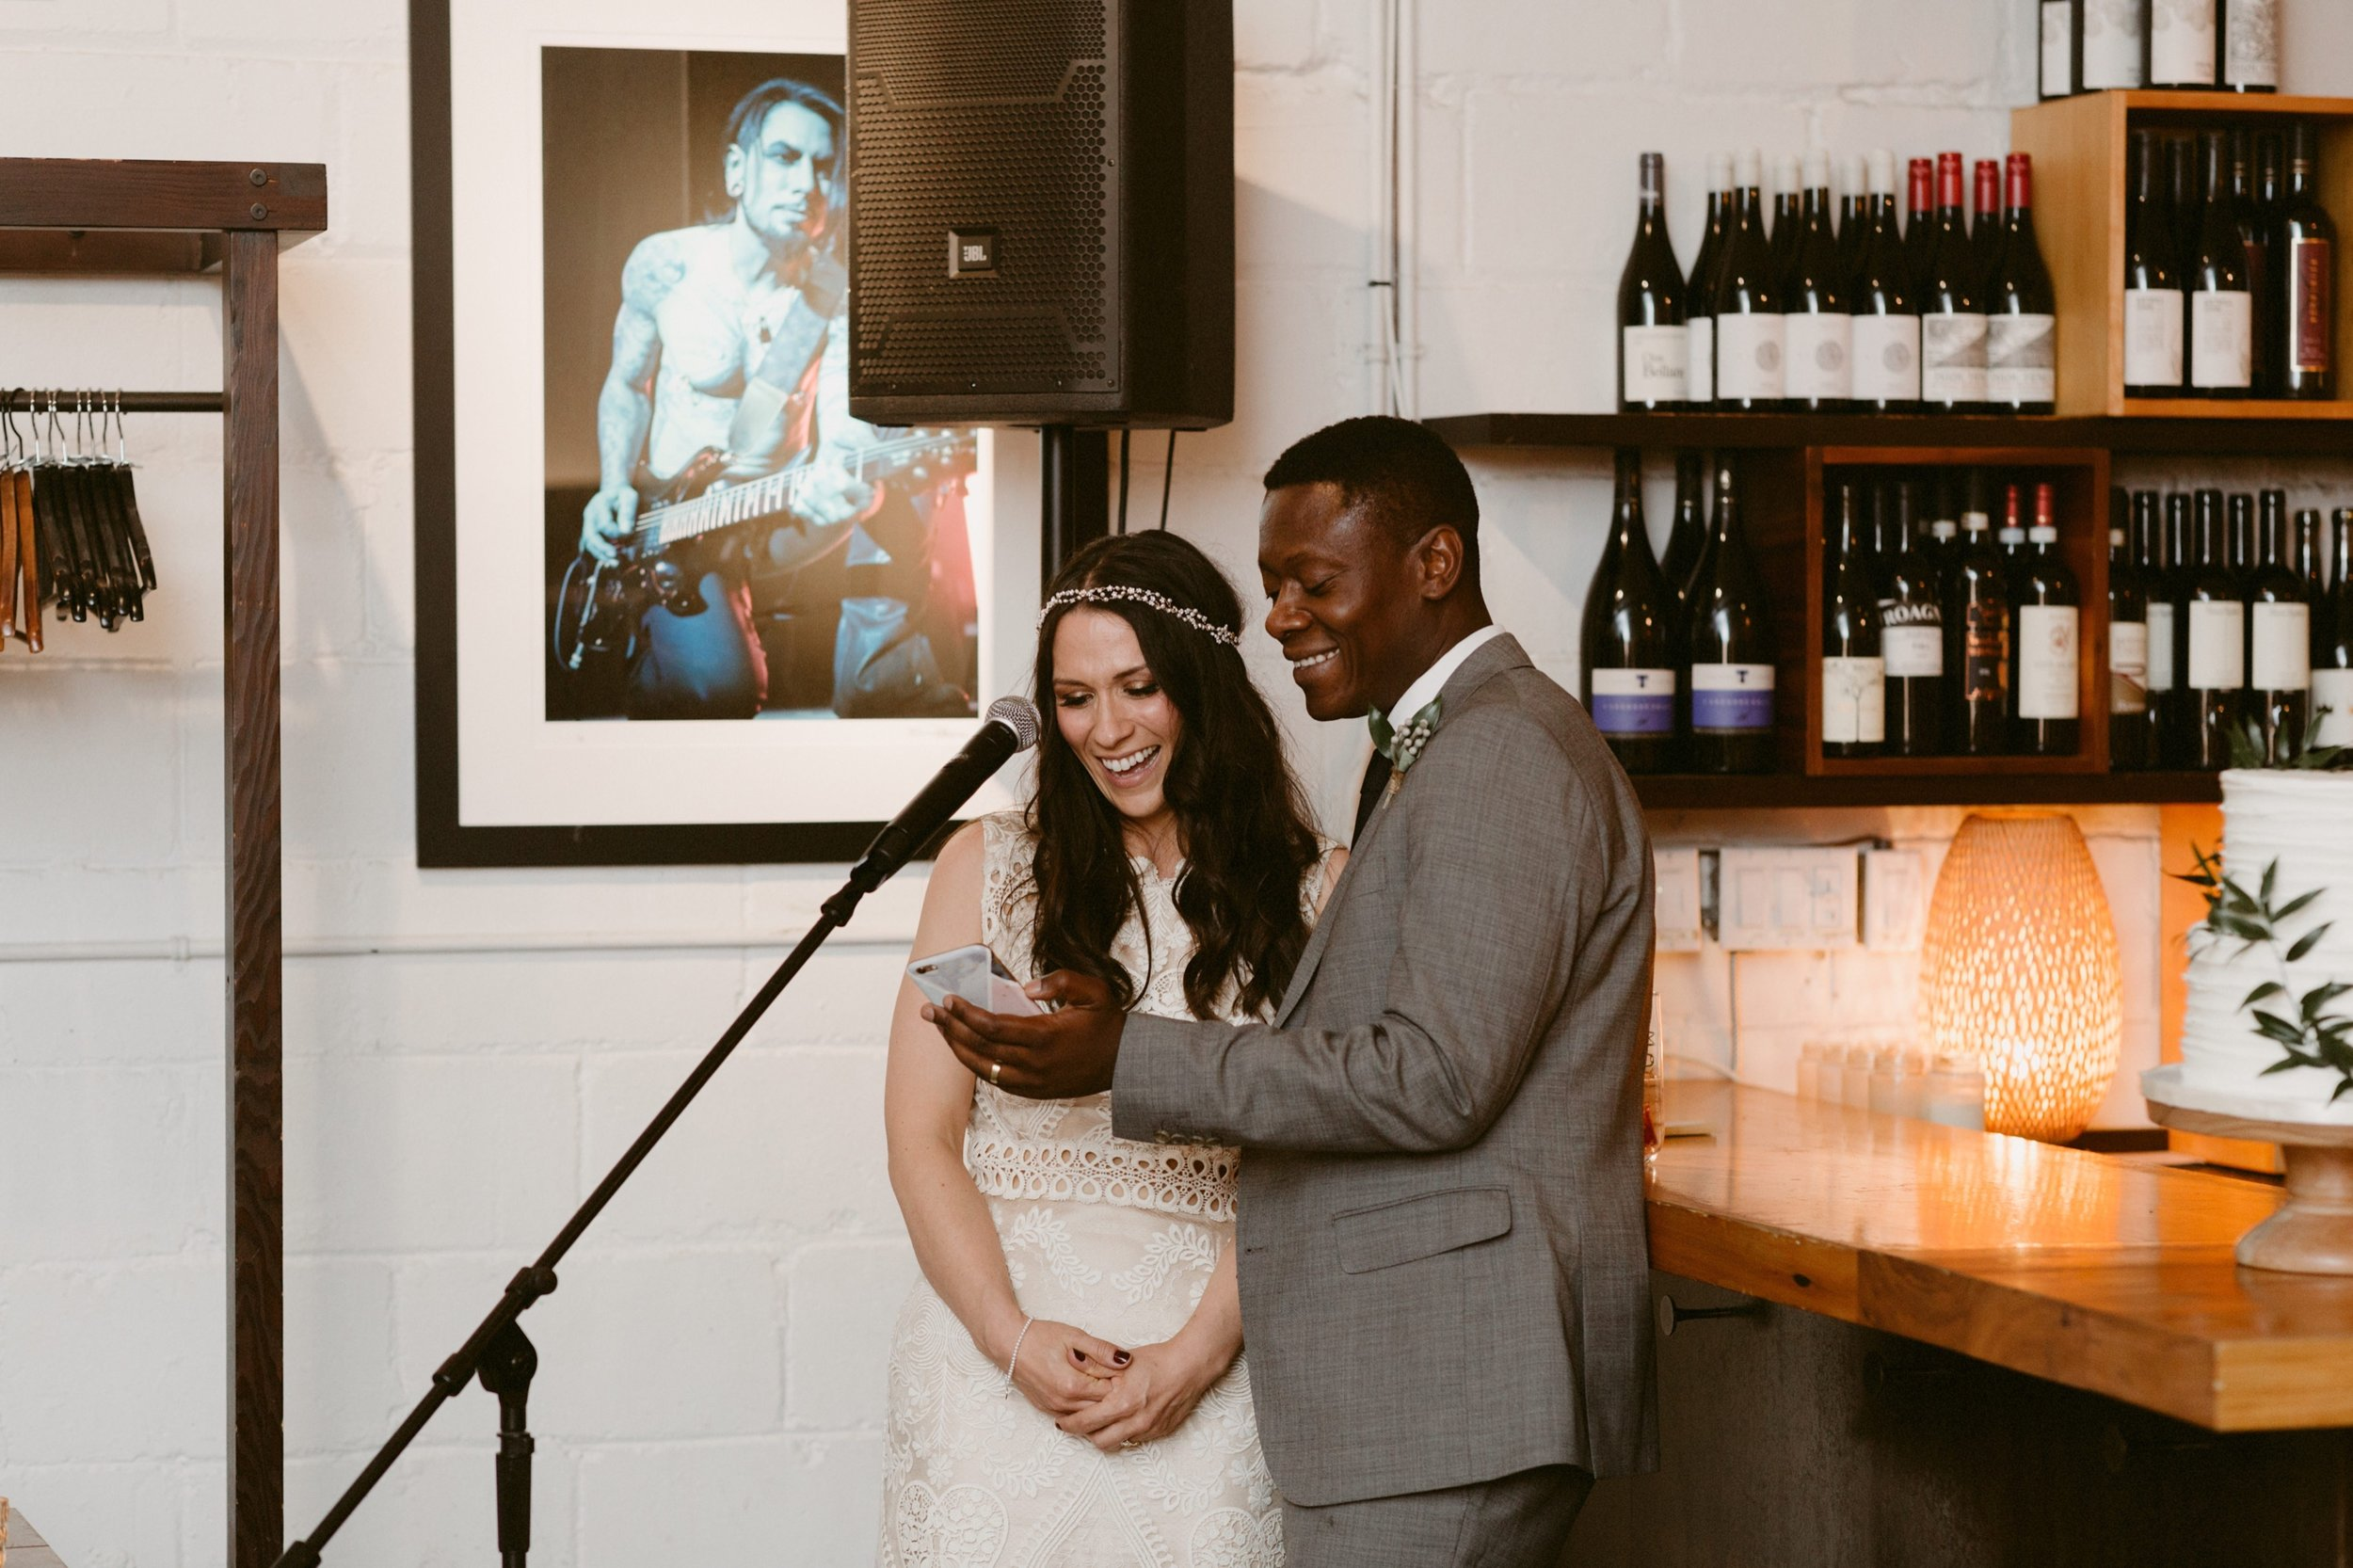 110_Spadina House Wedding (628 of 748)_intimate_Boehmer_Restaurant_Toronto_Wedding.jpg